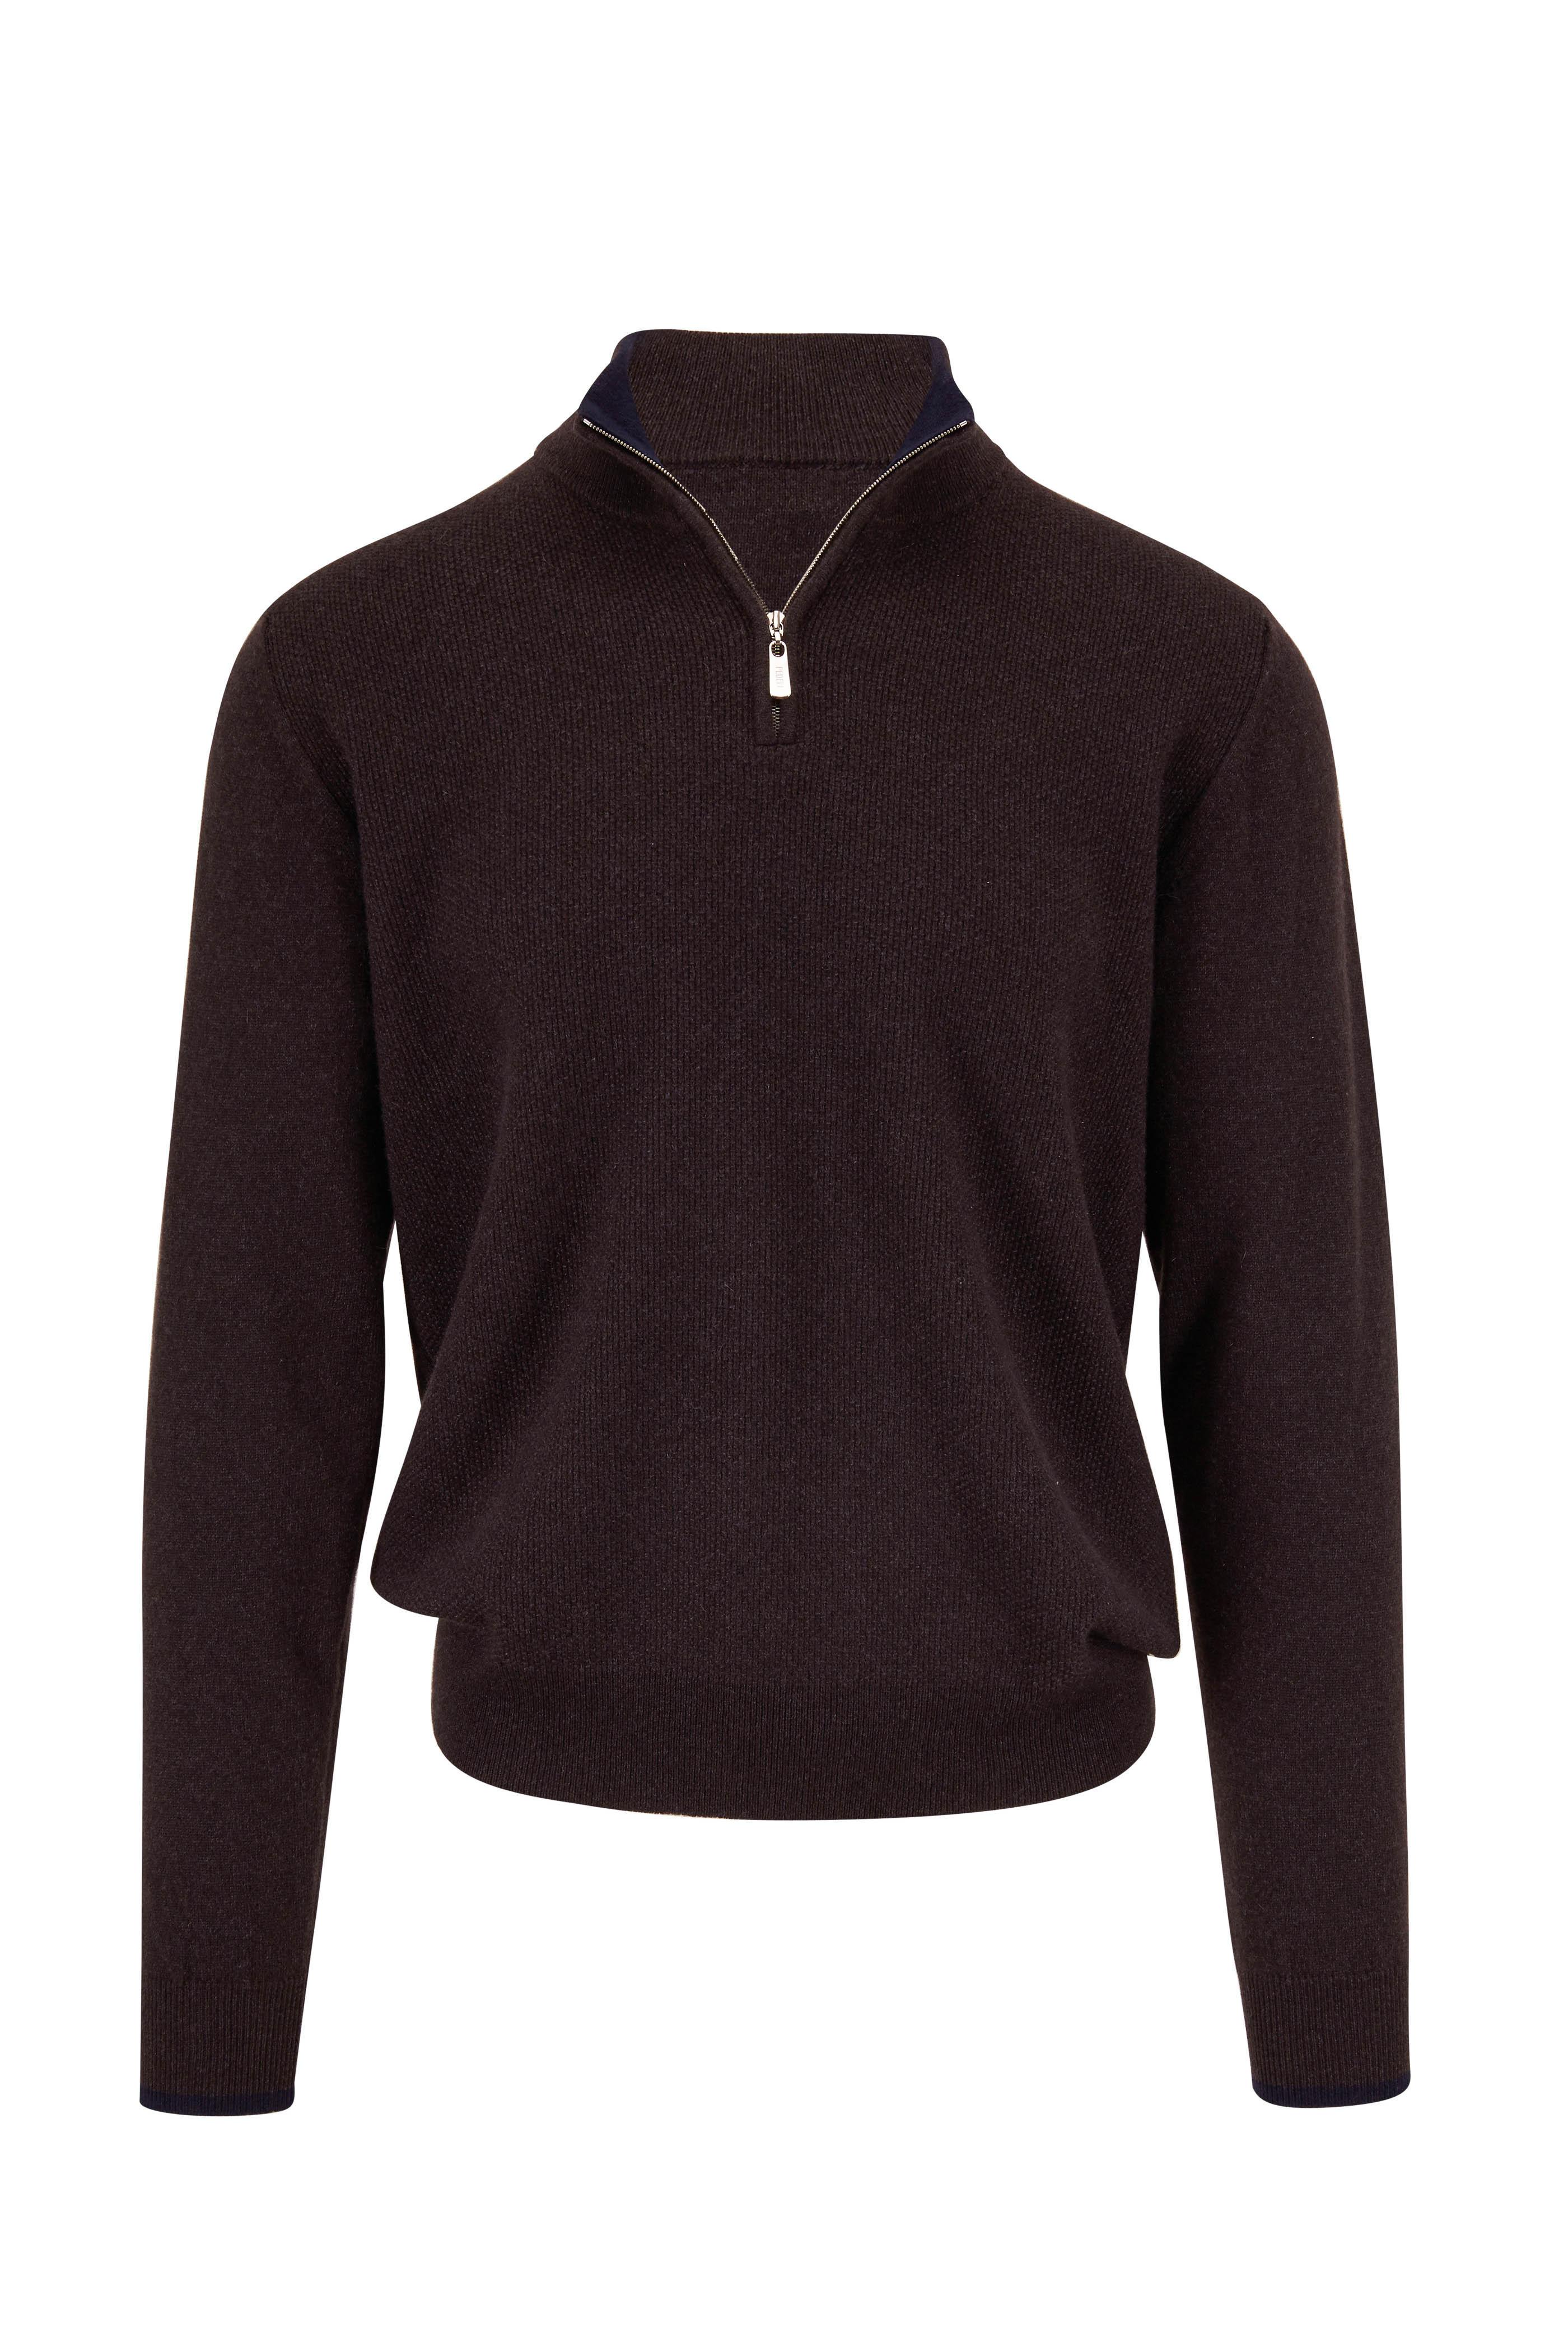 Fedeli Brown Textured Cashmere Quarter Zip Pullover